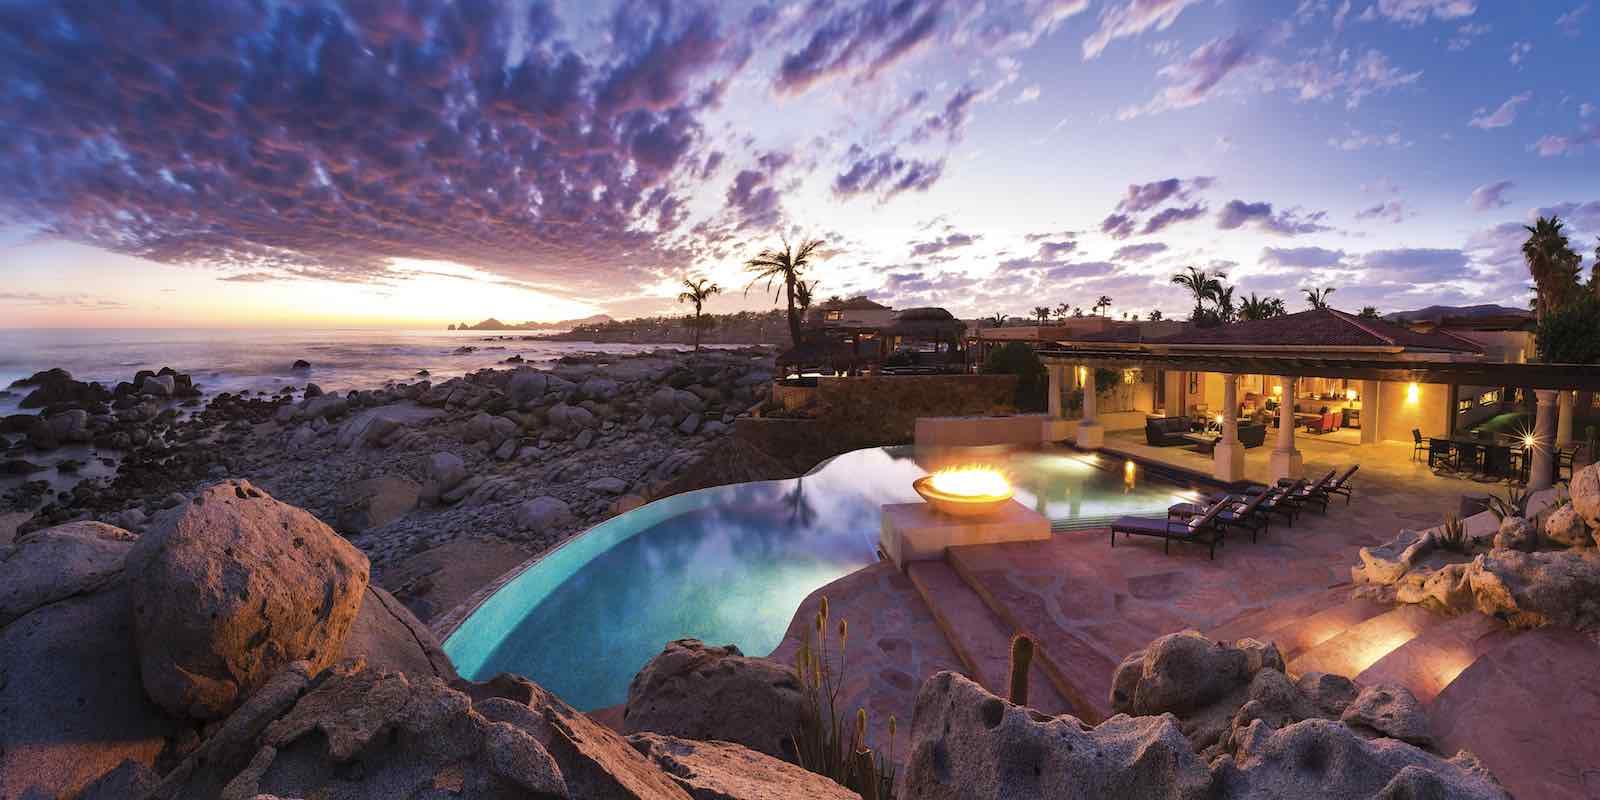 Las seis piscinas más extraordinarias de Inspirato Collection